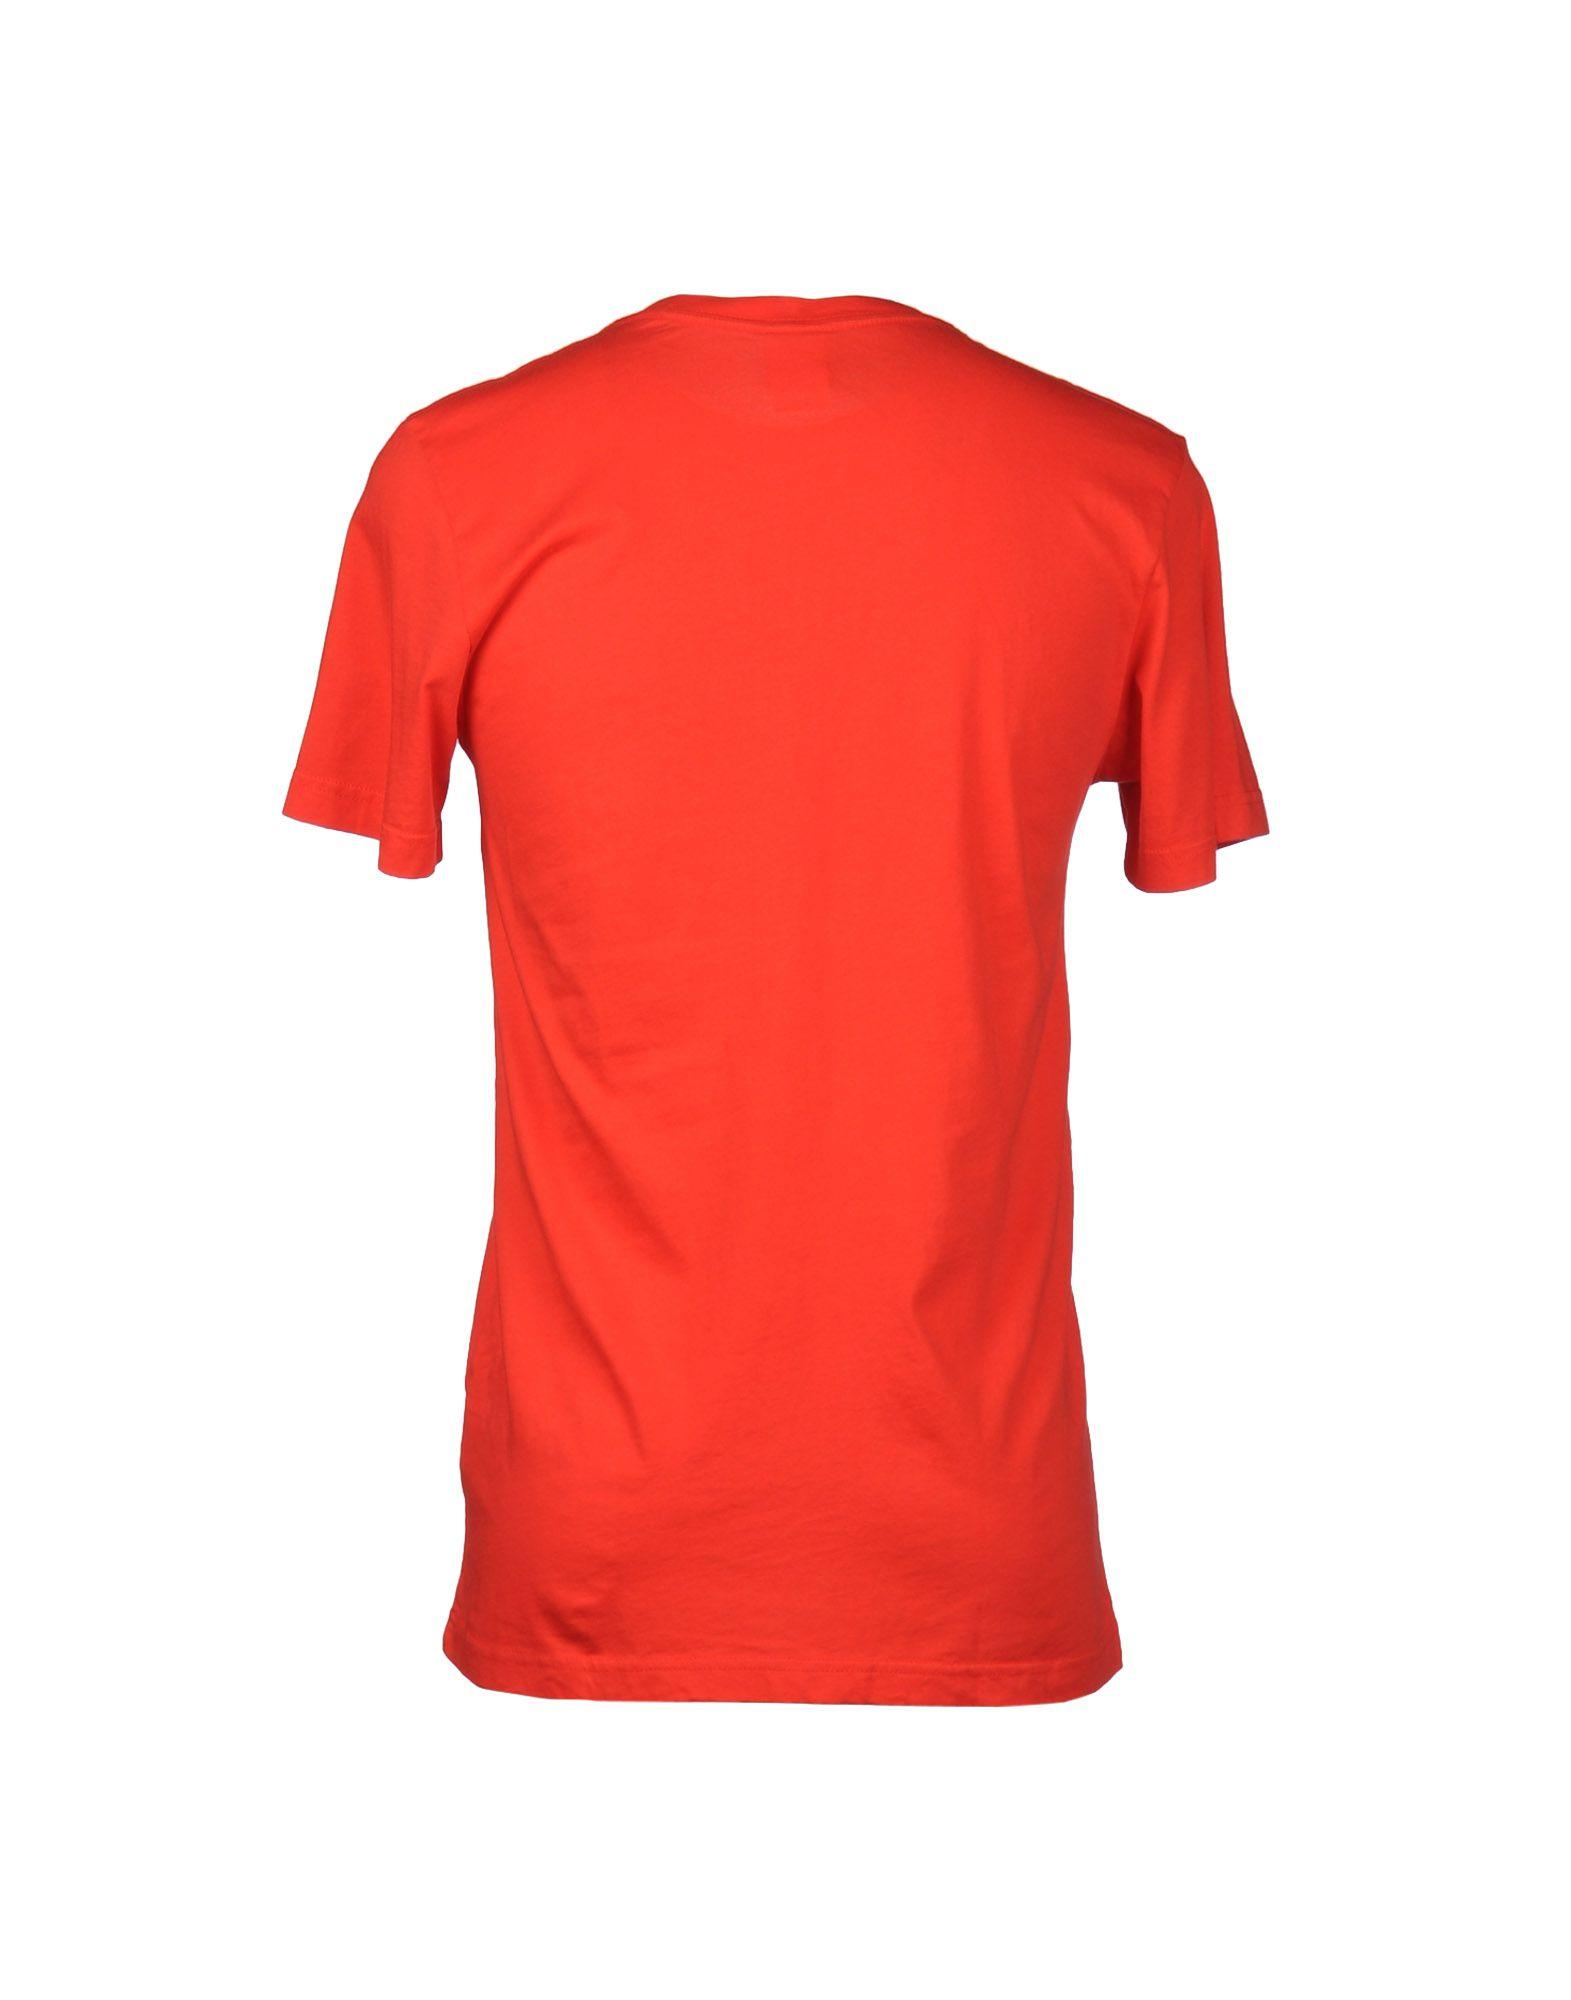 Nike short sleeve t shirt in red for men lyst for Nike short sleeve shirt